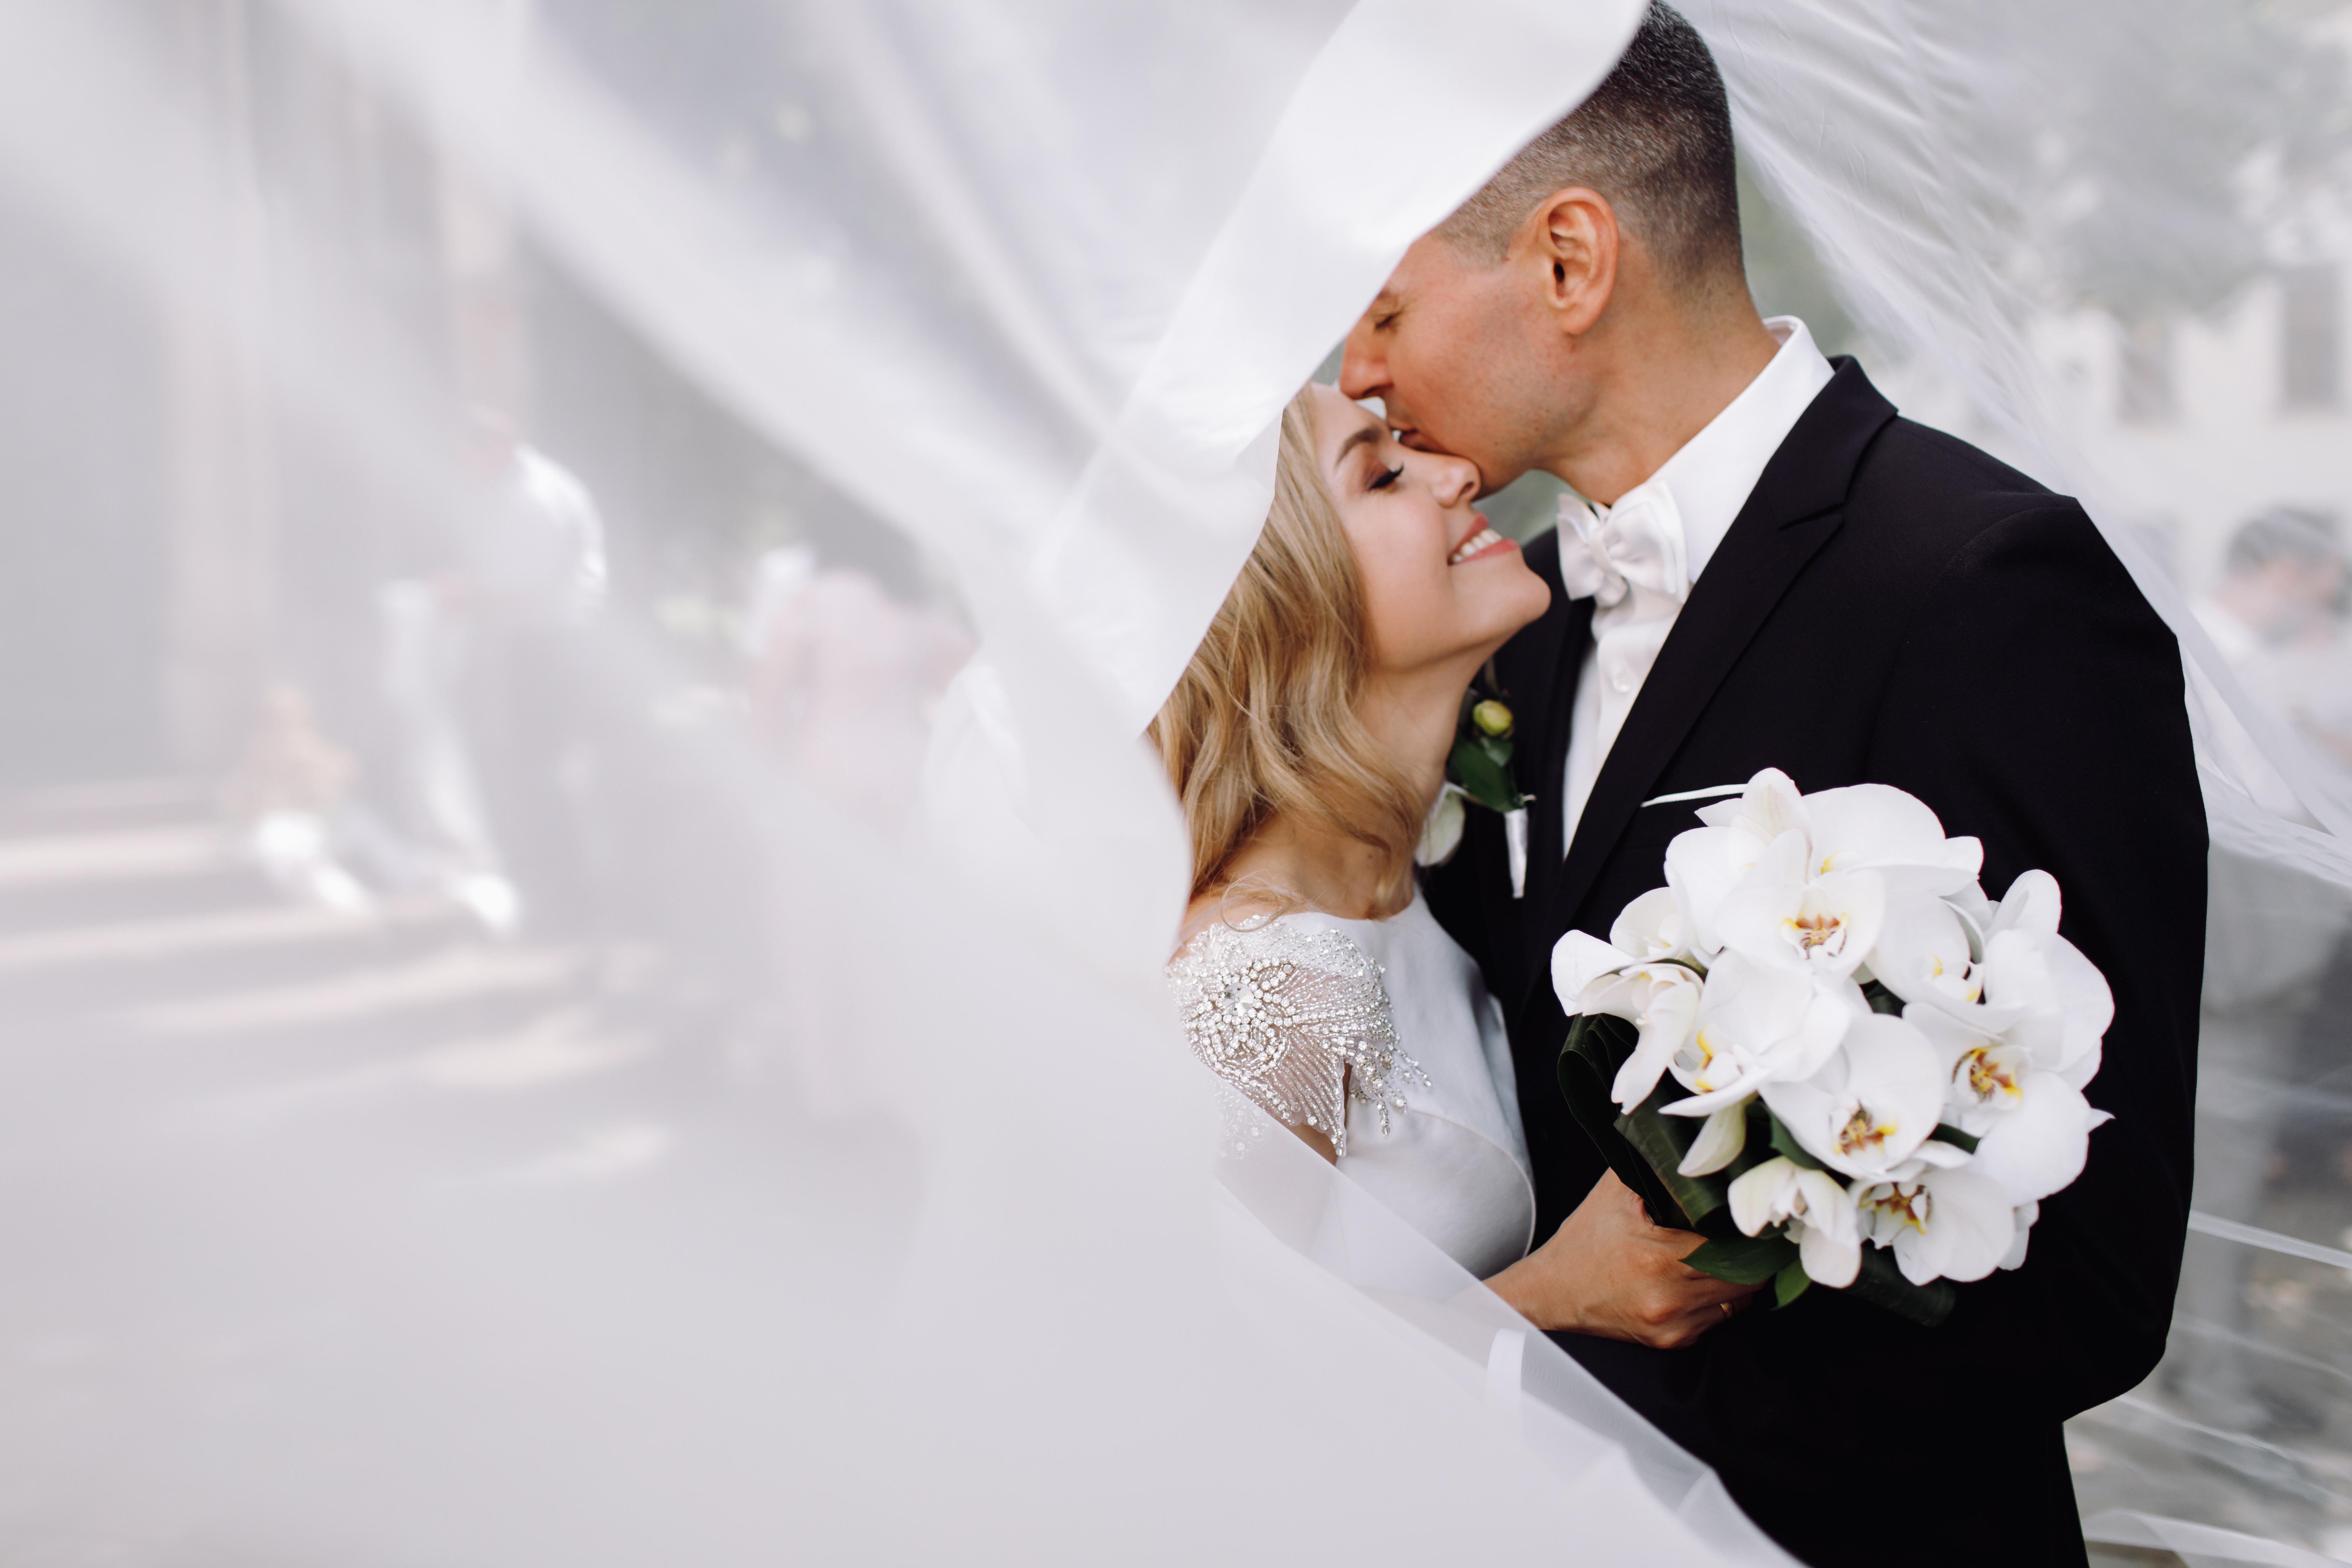 Pareja novios boda coronavirus nueva normalidad